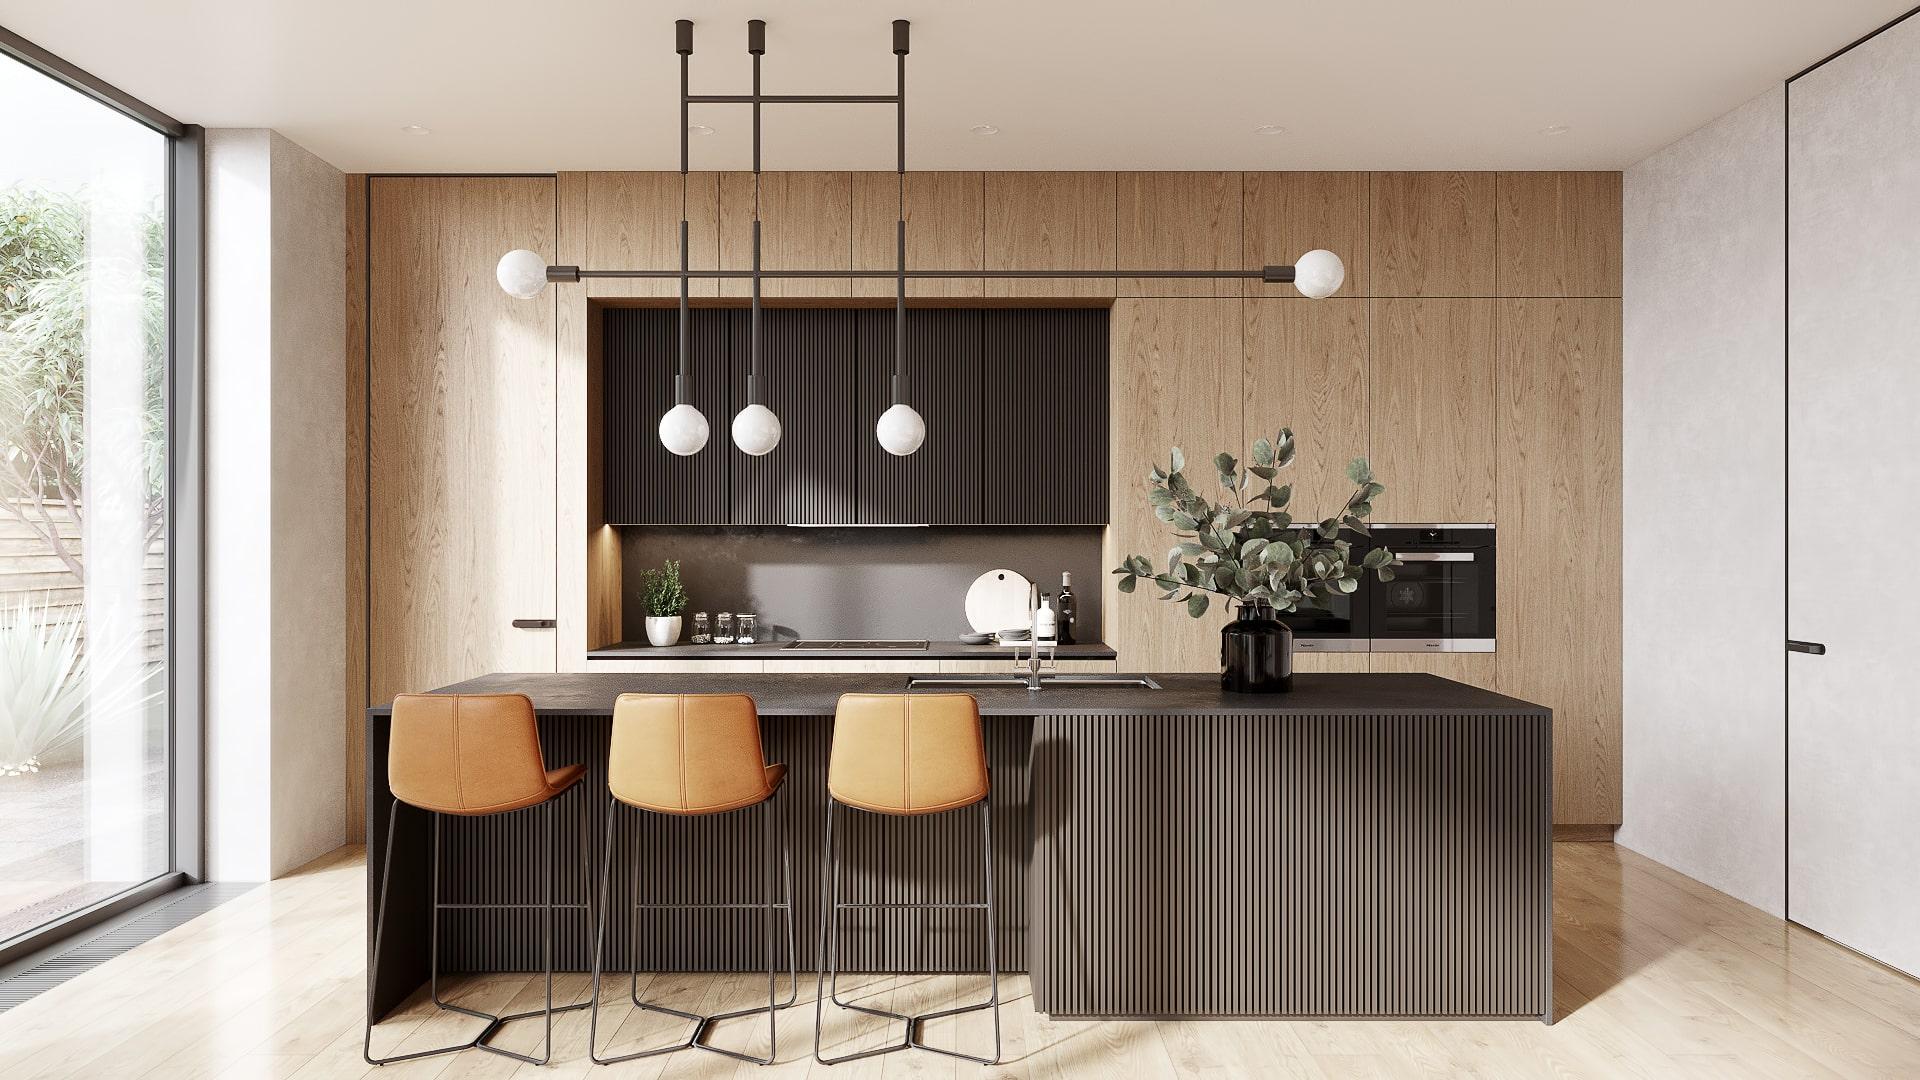 Kitchen Design Rendering for a Portfolio on a Designer's Site